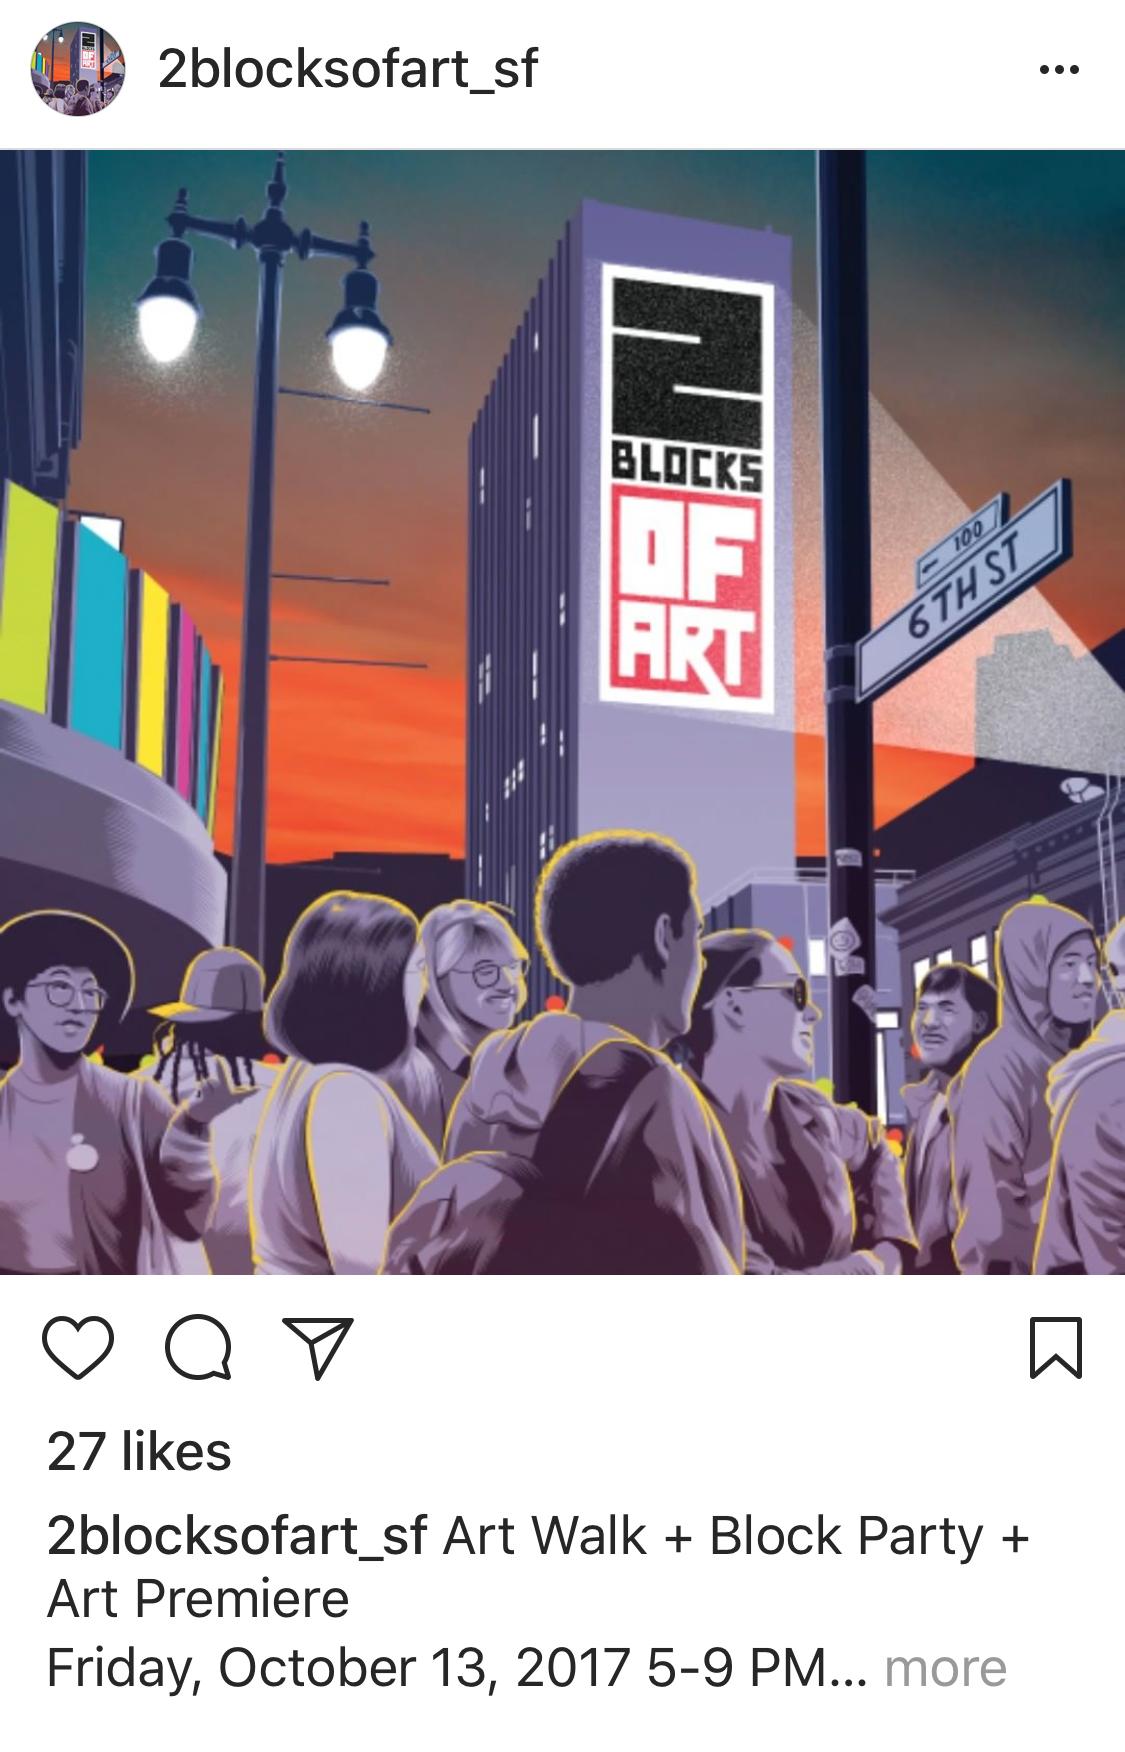 Screenshot of artwork posted on 2blcoksofart_sf instagram